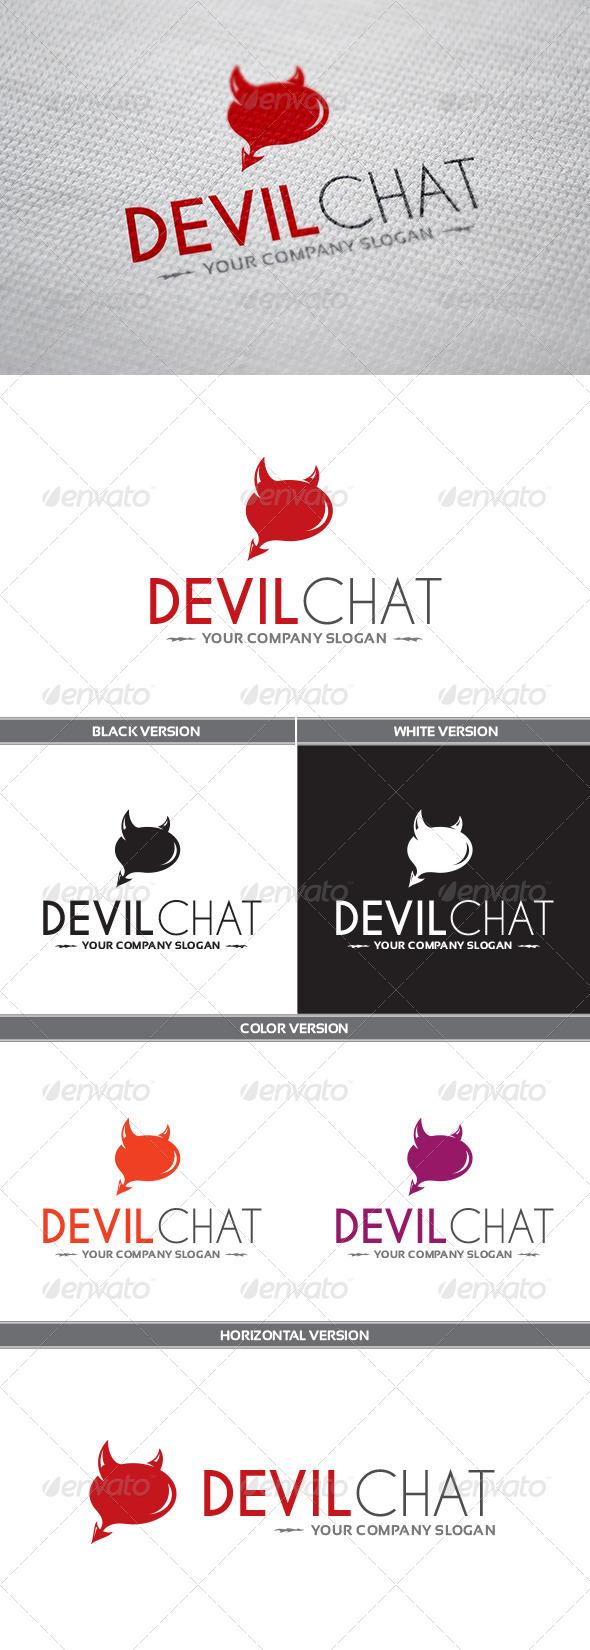 DevilChat Logo